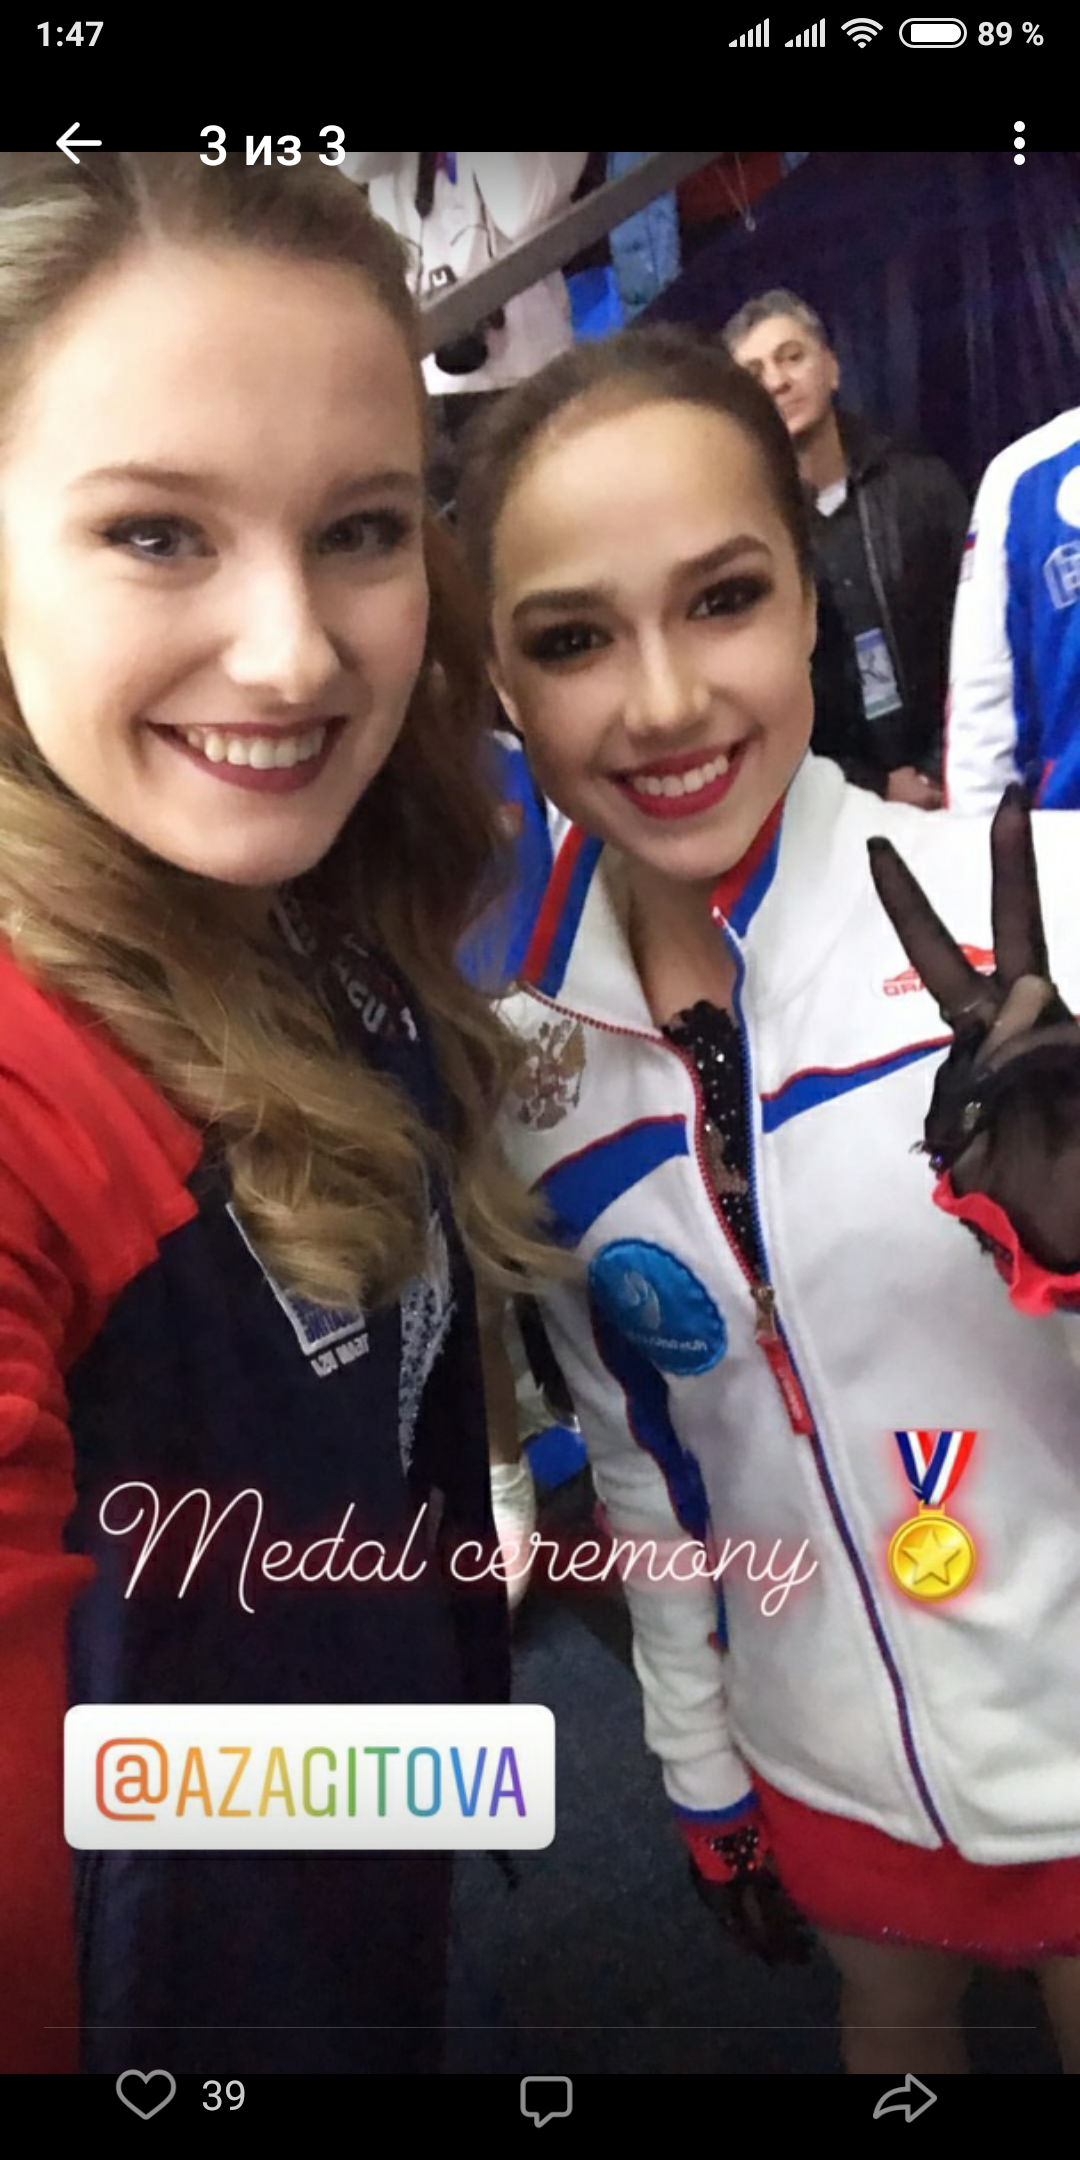 Алина Ильназовна Загитова-2 | Олимпийская чемпионка - Страница 4 Jq9xu